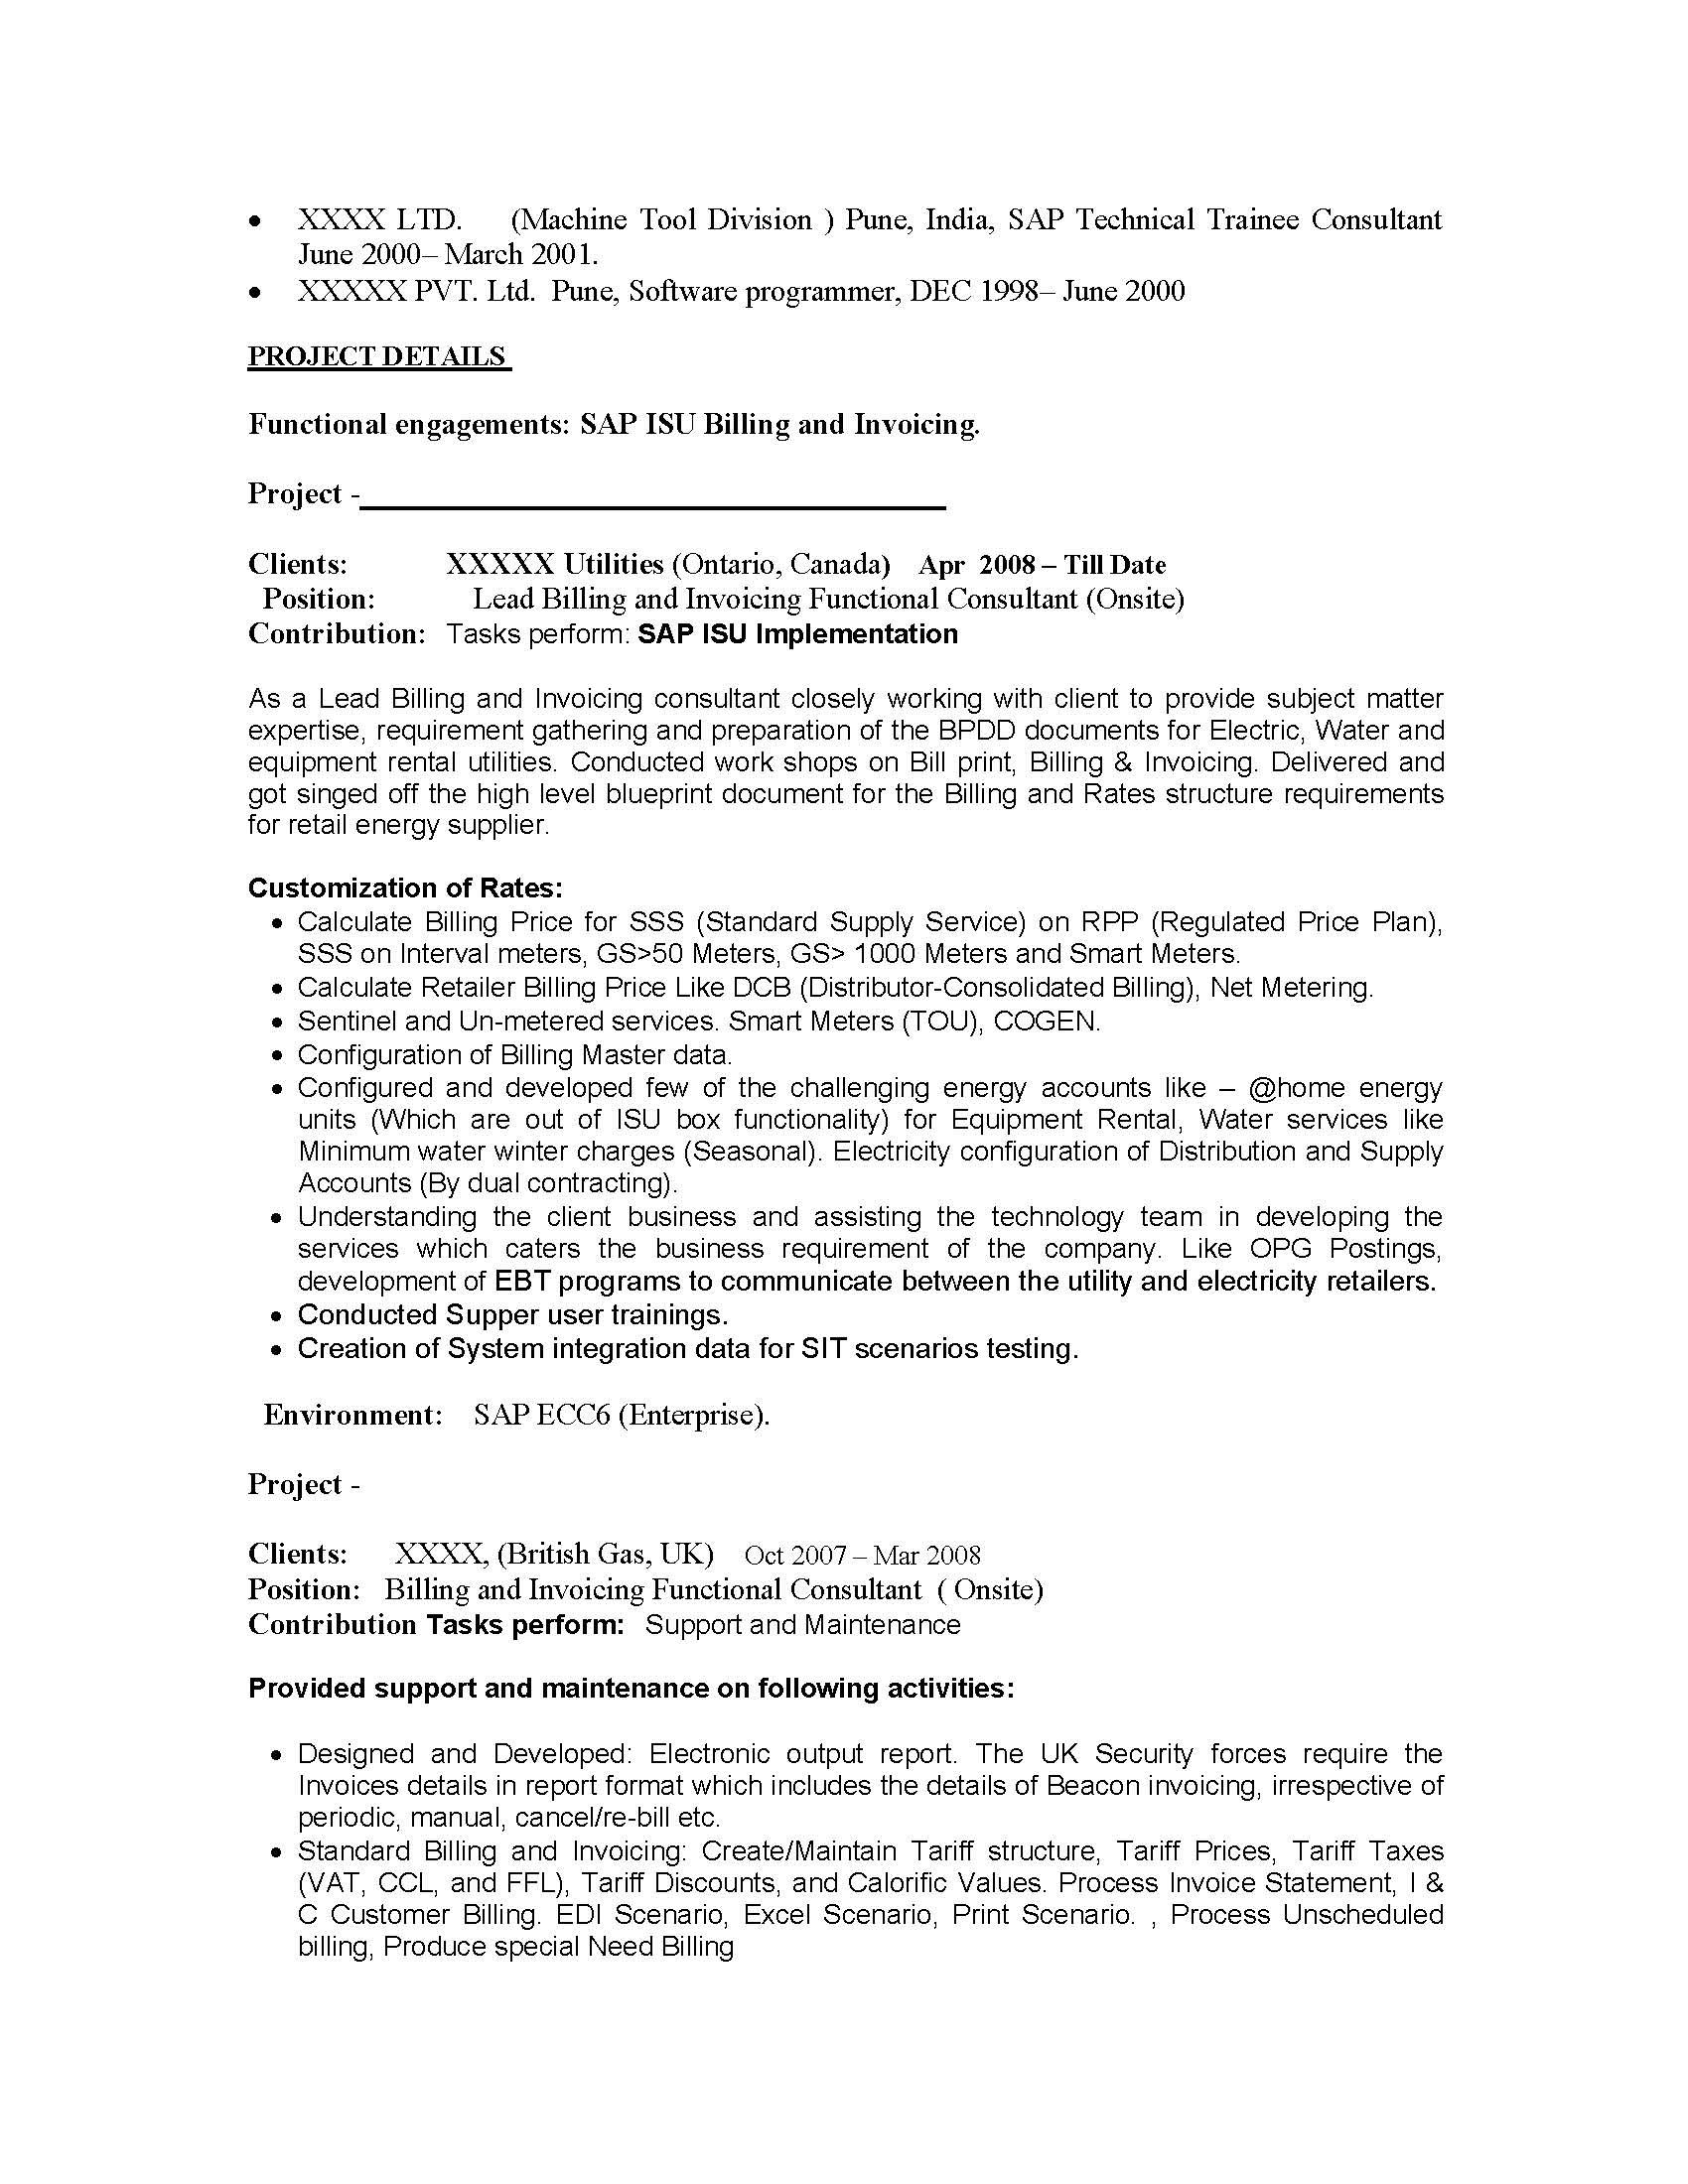 Sap Pp Consultant Resume Sample   Post Internship Thank You Letter ...